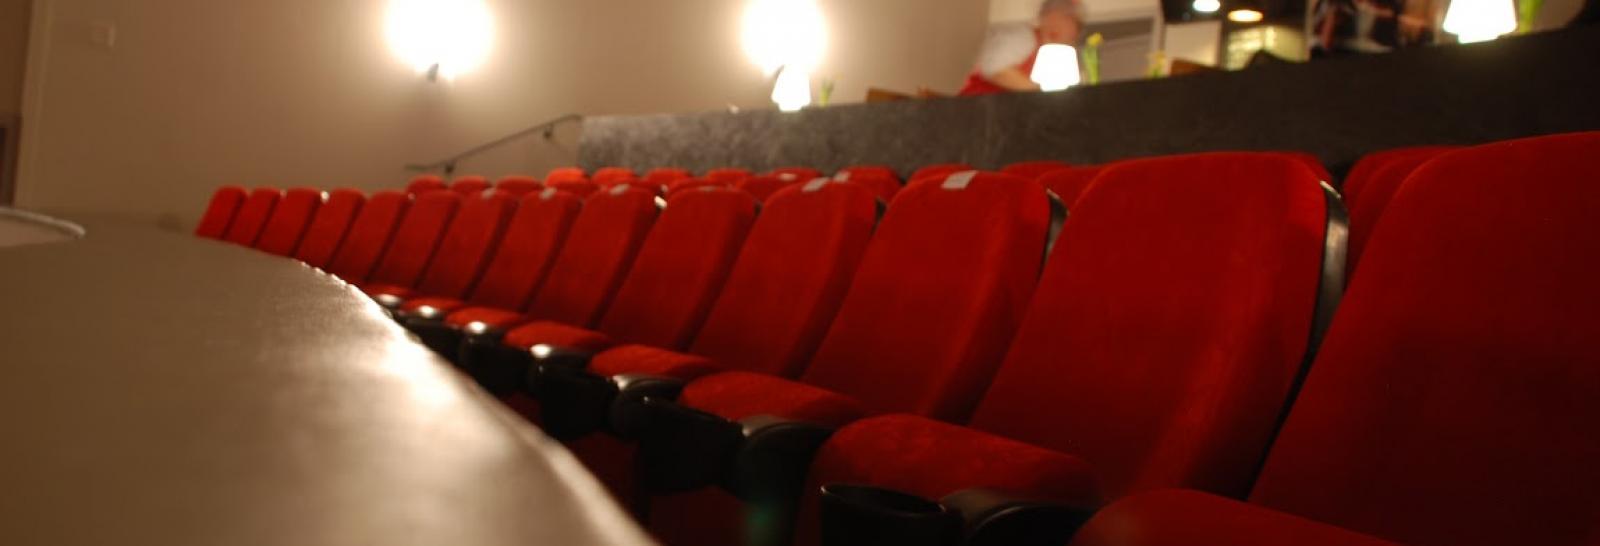 Kino Roxy Programm